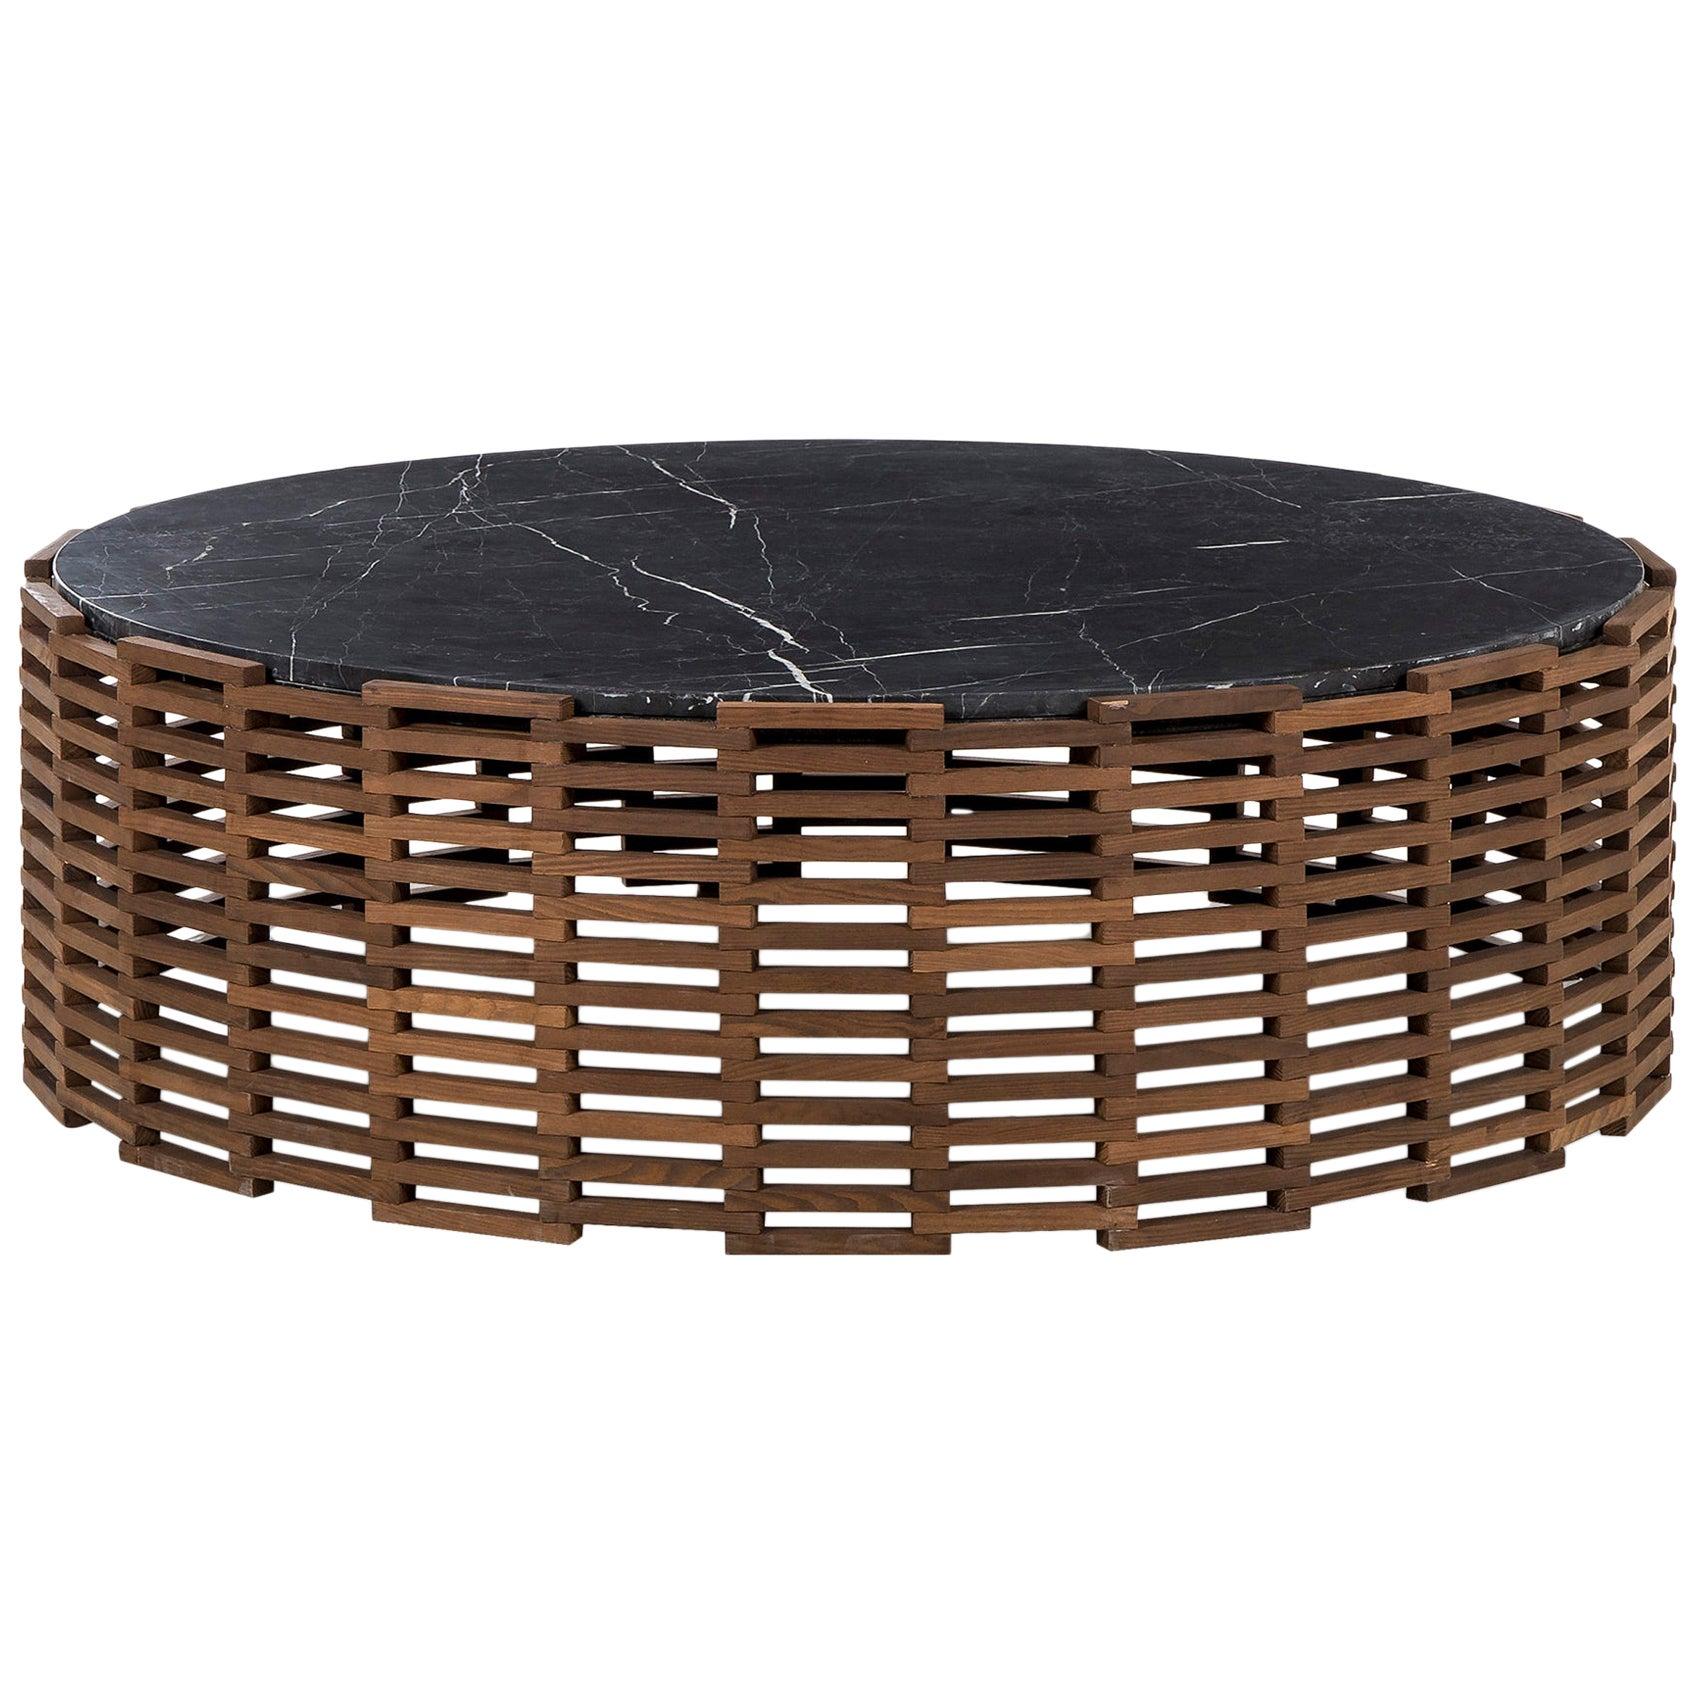 Doriana Round Coffee Table